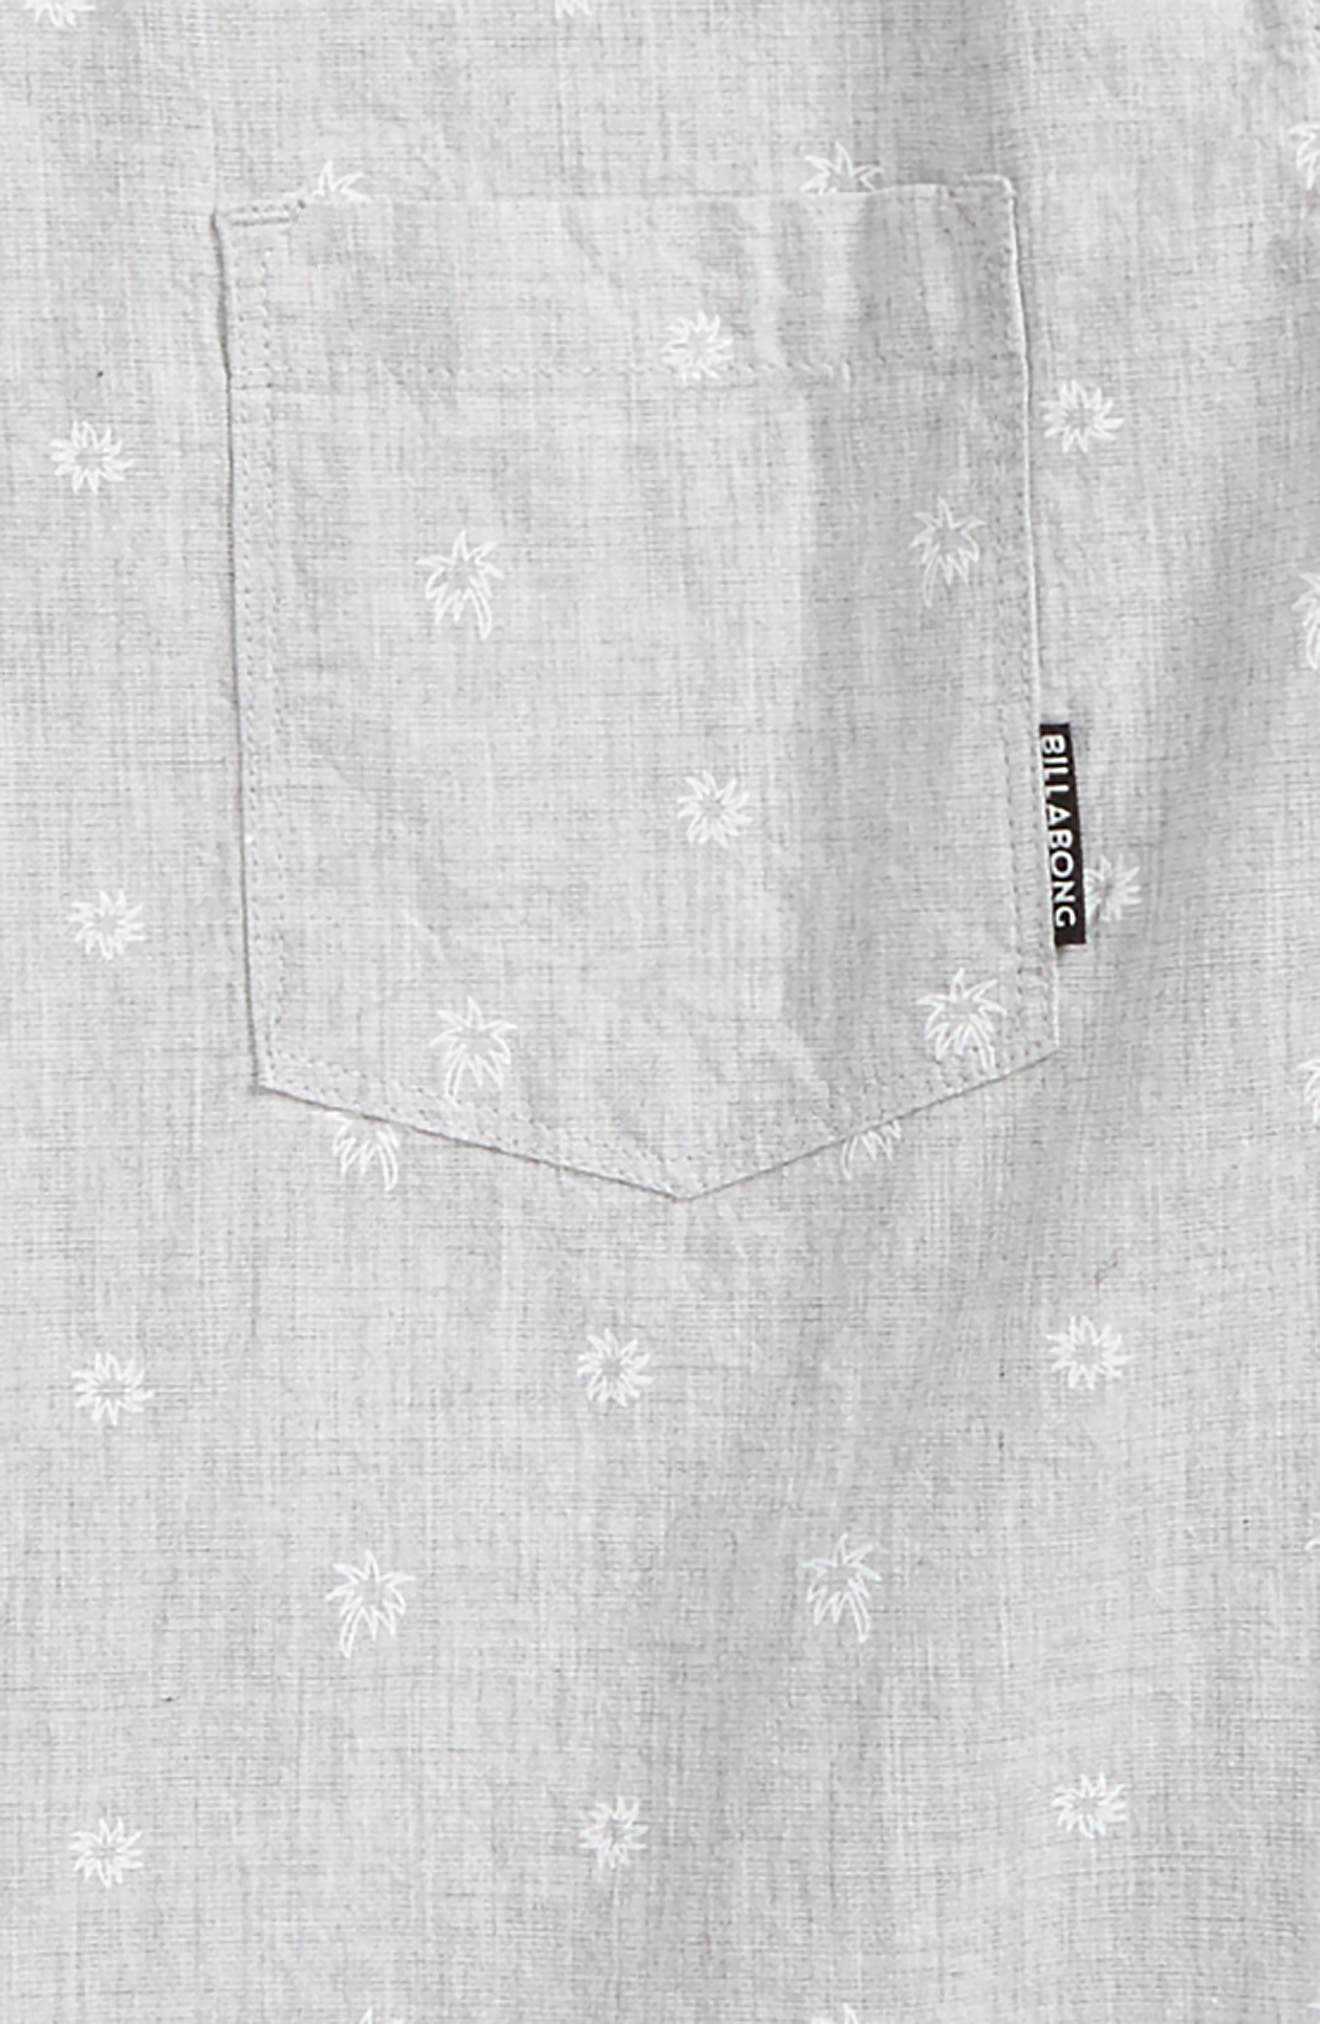 Sundays Mini Short Sleeve Woven Shirt,                             Alternate thumbnail 2, color,                             Light Grey Heather